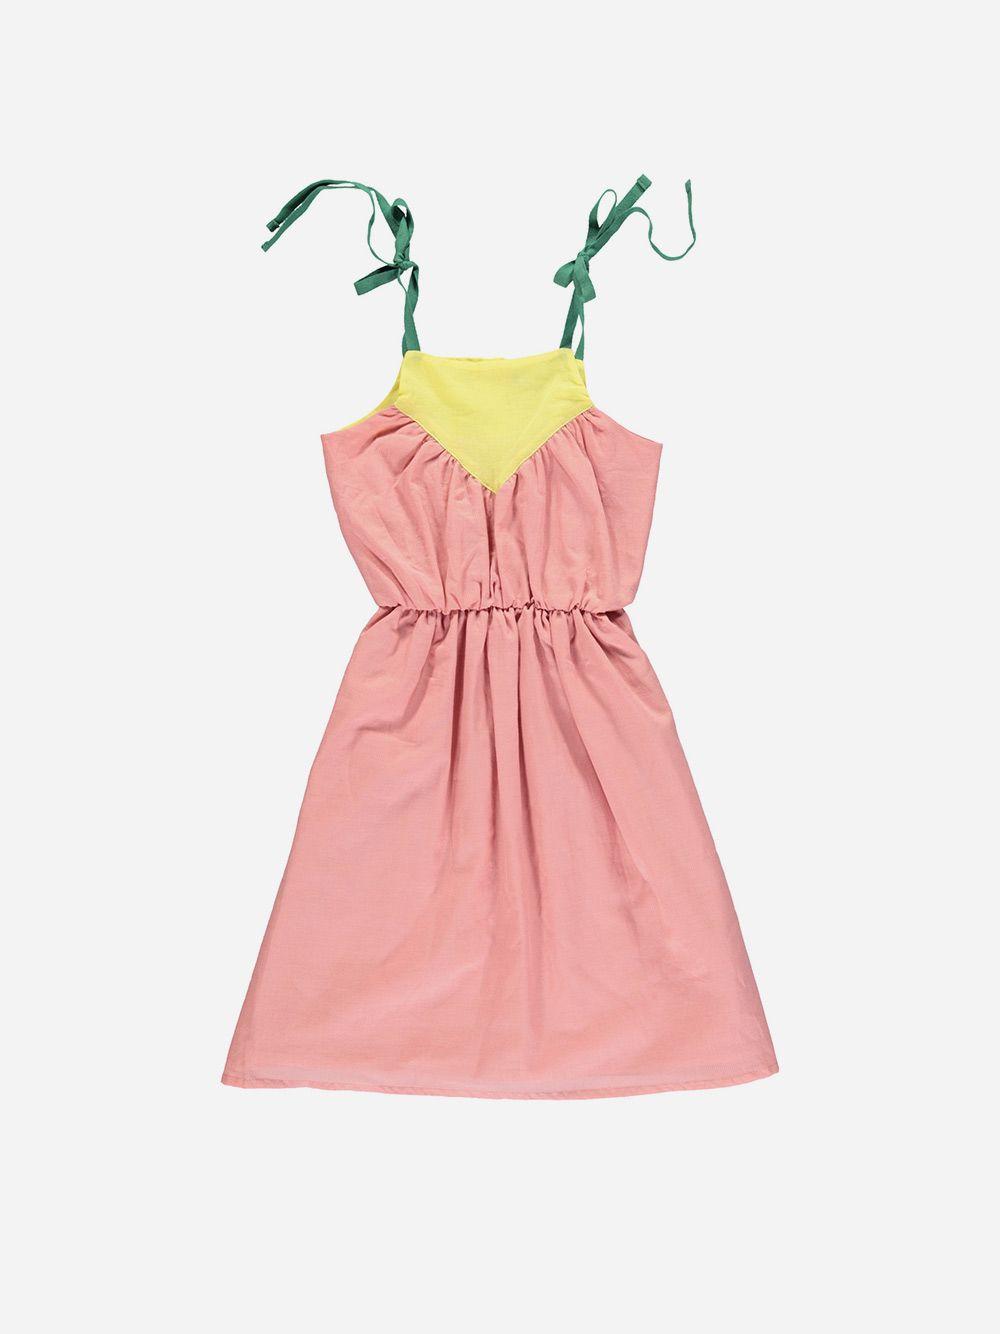 Tricolor Long Dress Vintage Pink